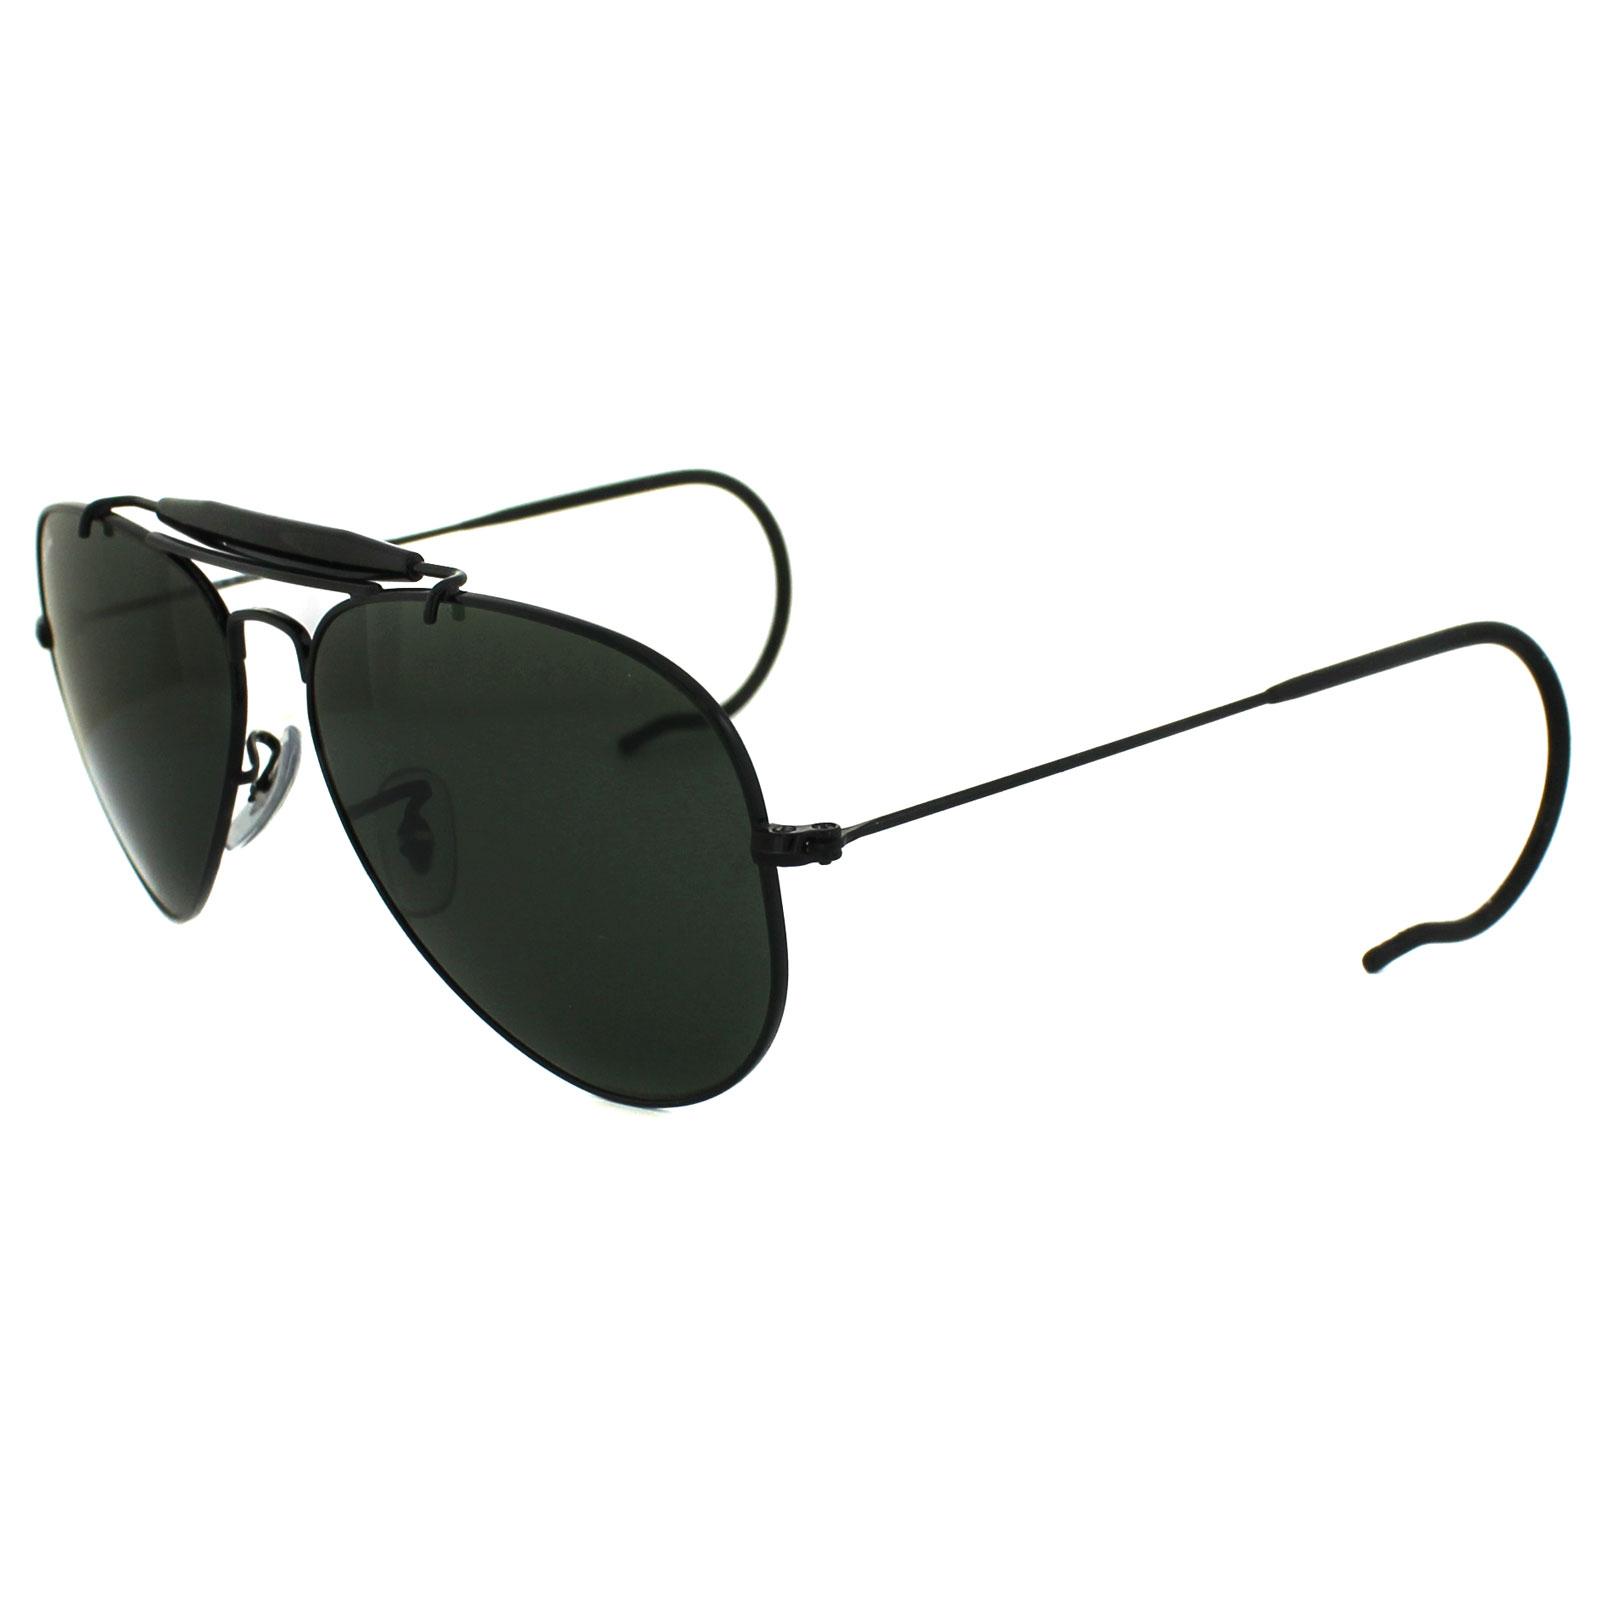 6a3fa913096 Ray-Ban Sunglasses Outdoorsman 3030 L9500 Black Green 805289695004 ...